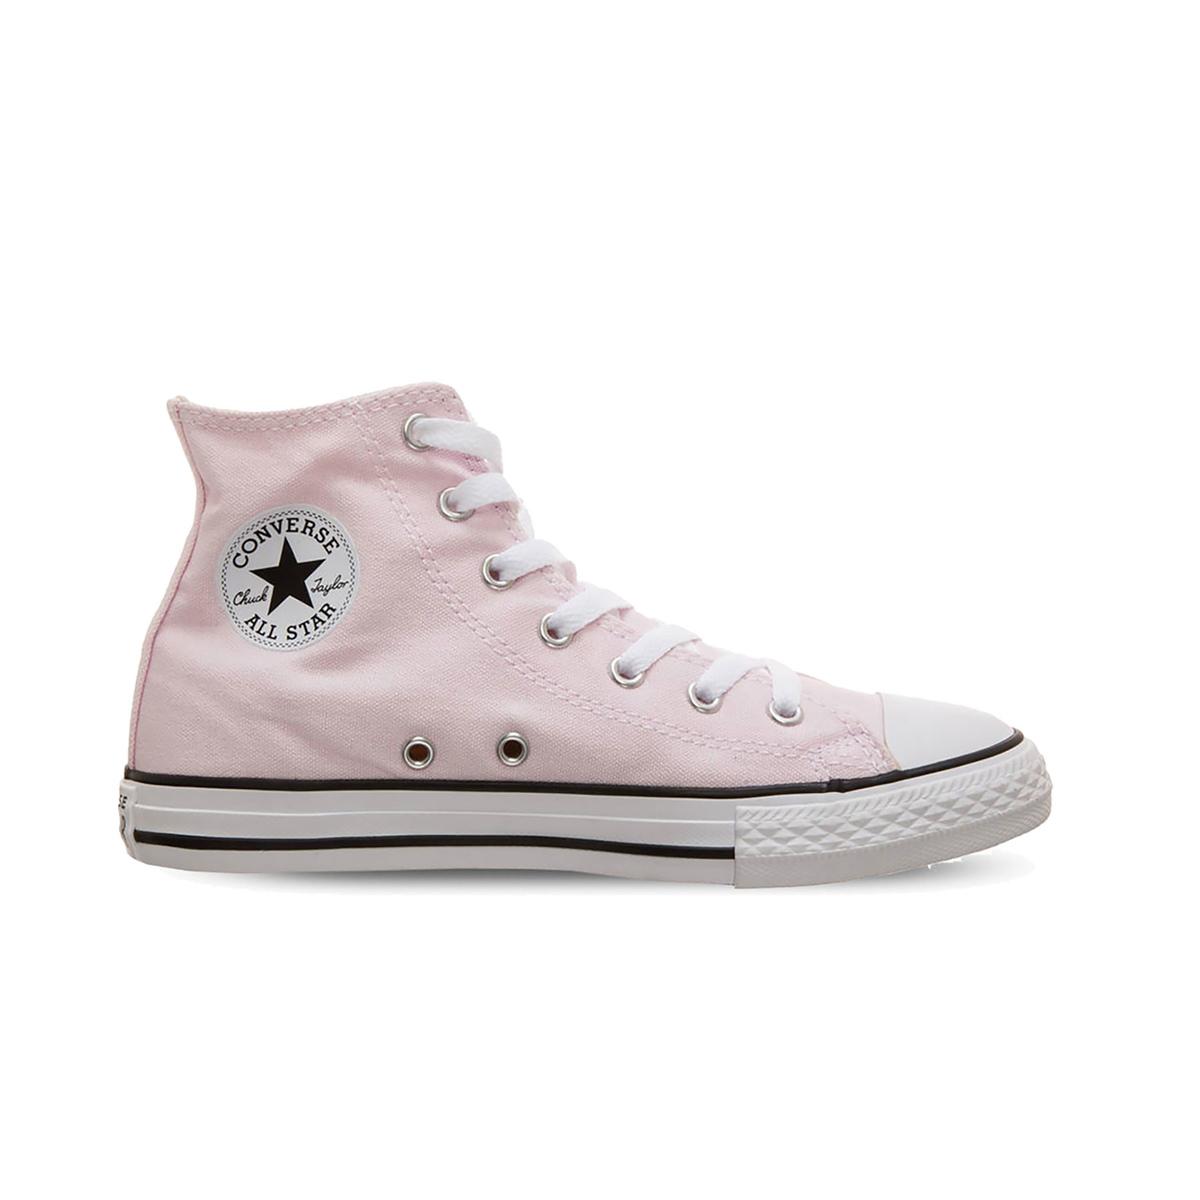 Converse | CHUCK TAYLOR ALL STAR hi bambina | Shoppingscanner